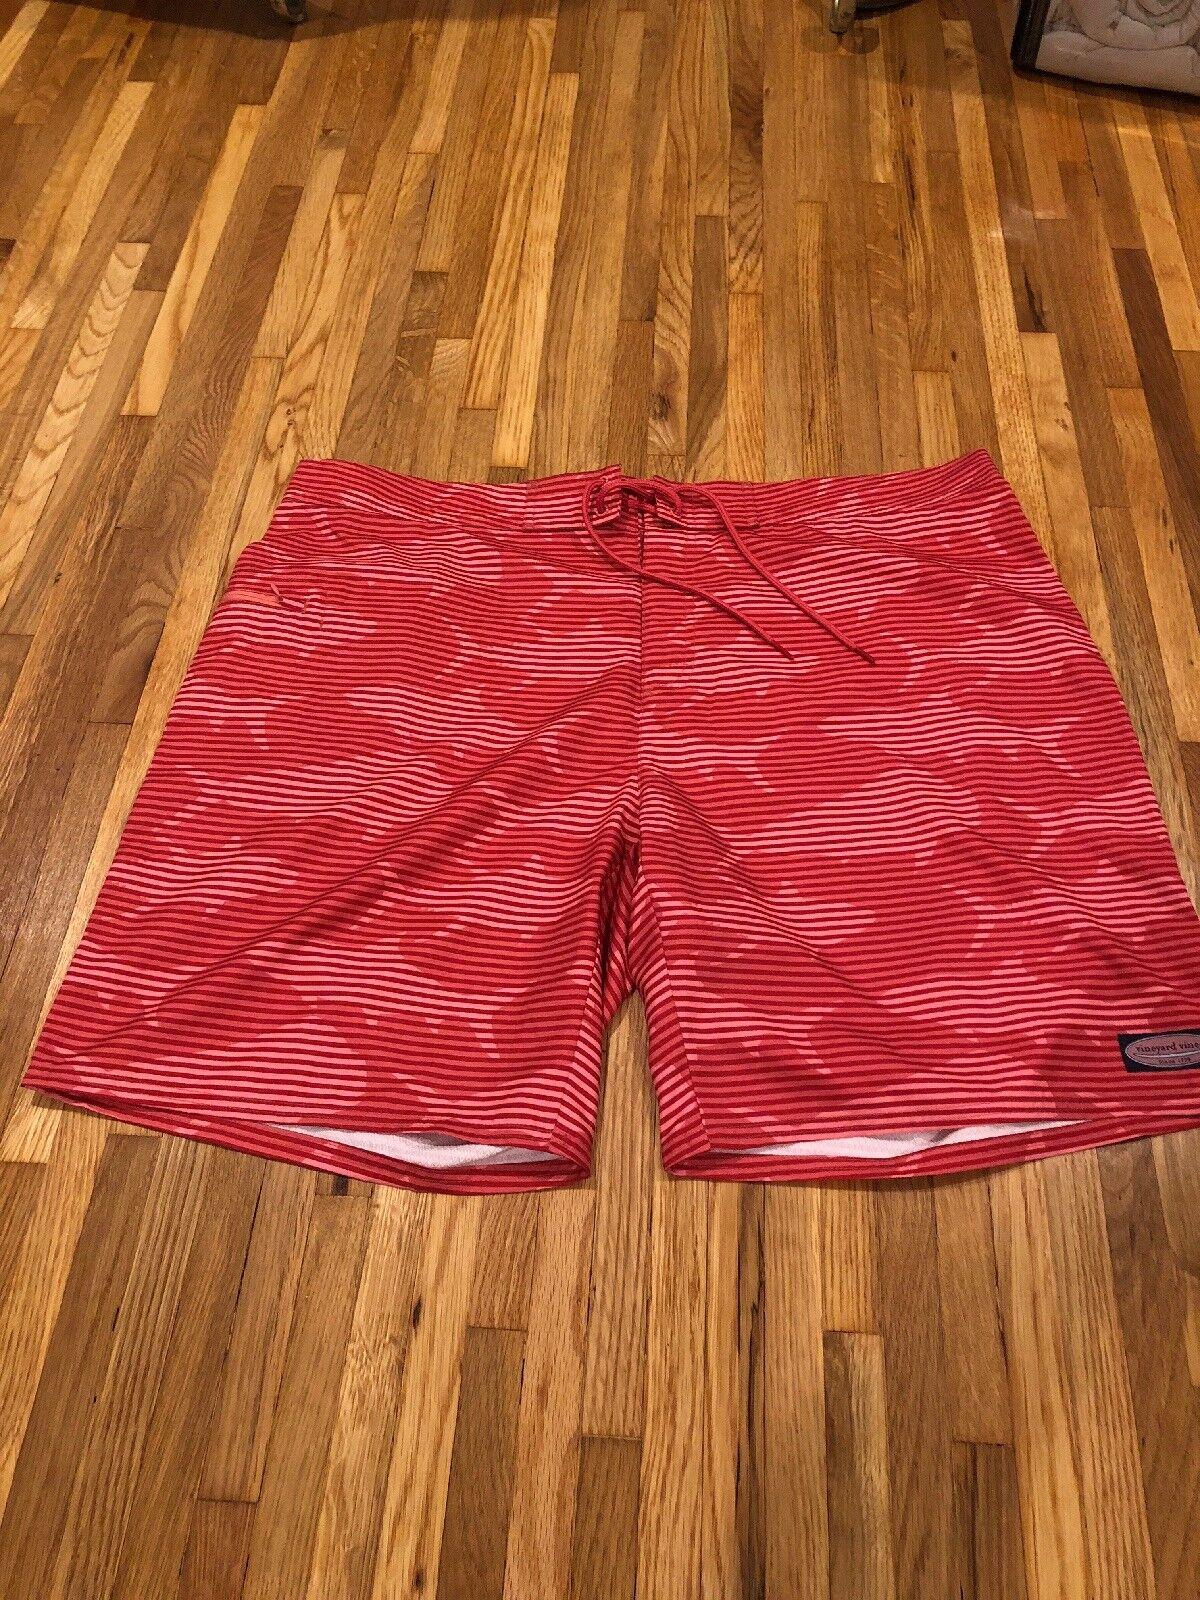 Vineyard Vines Sz 42 Board Shorts Swim Trunks Striped Red & Pink NWOT